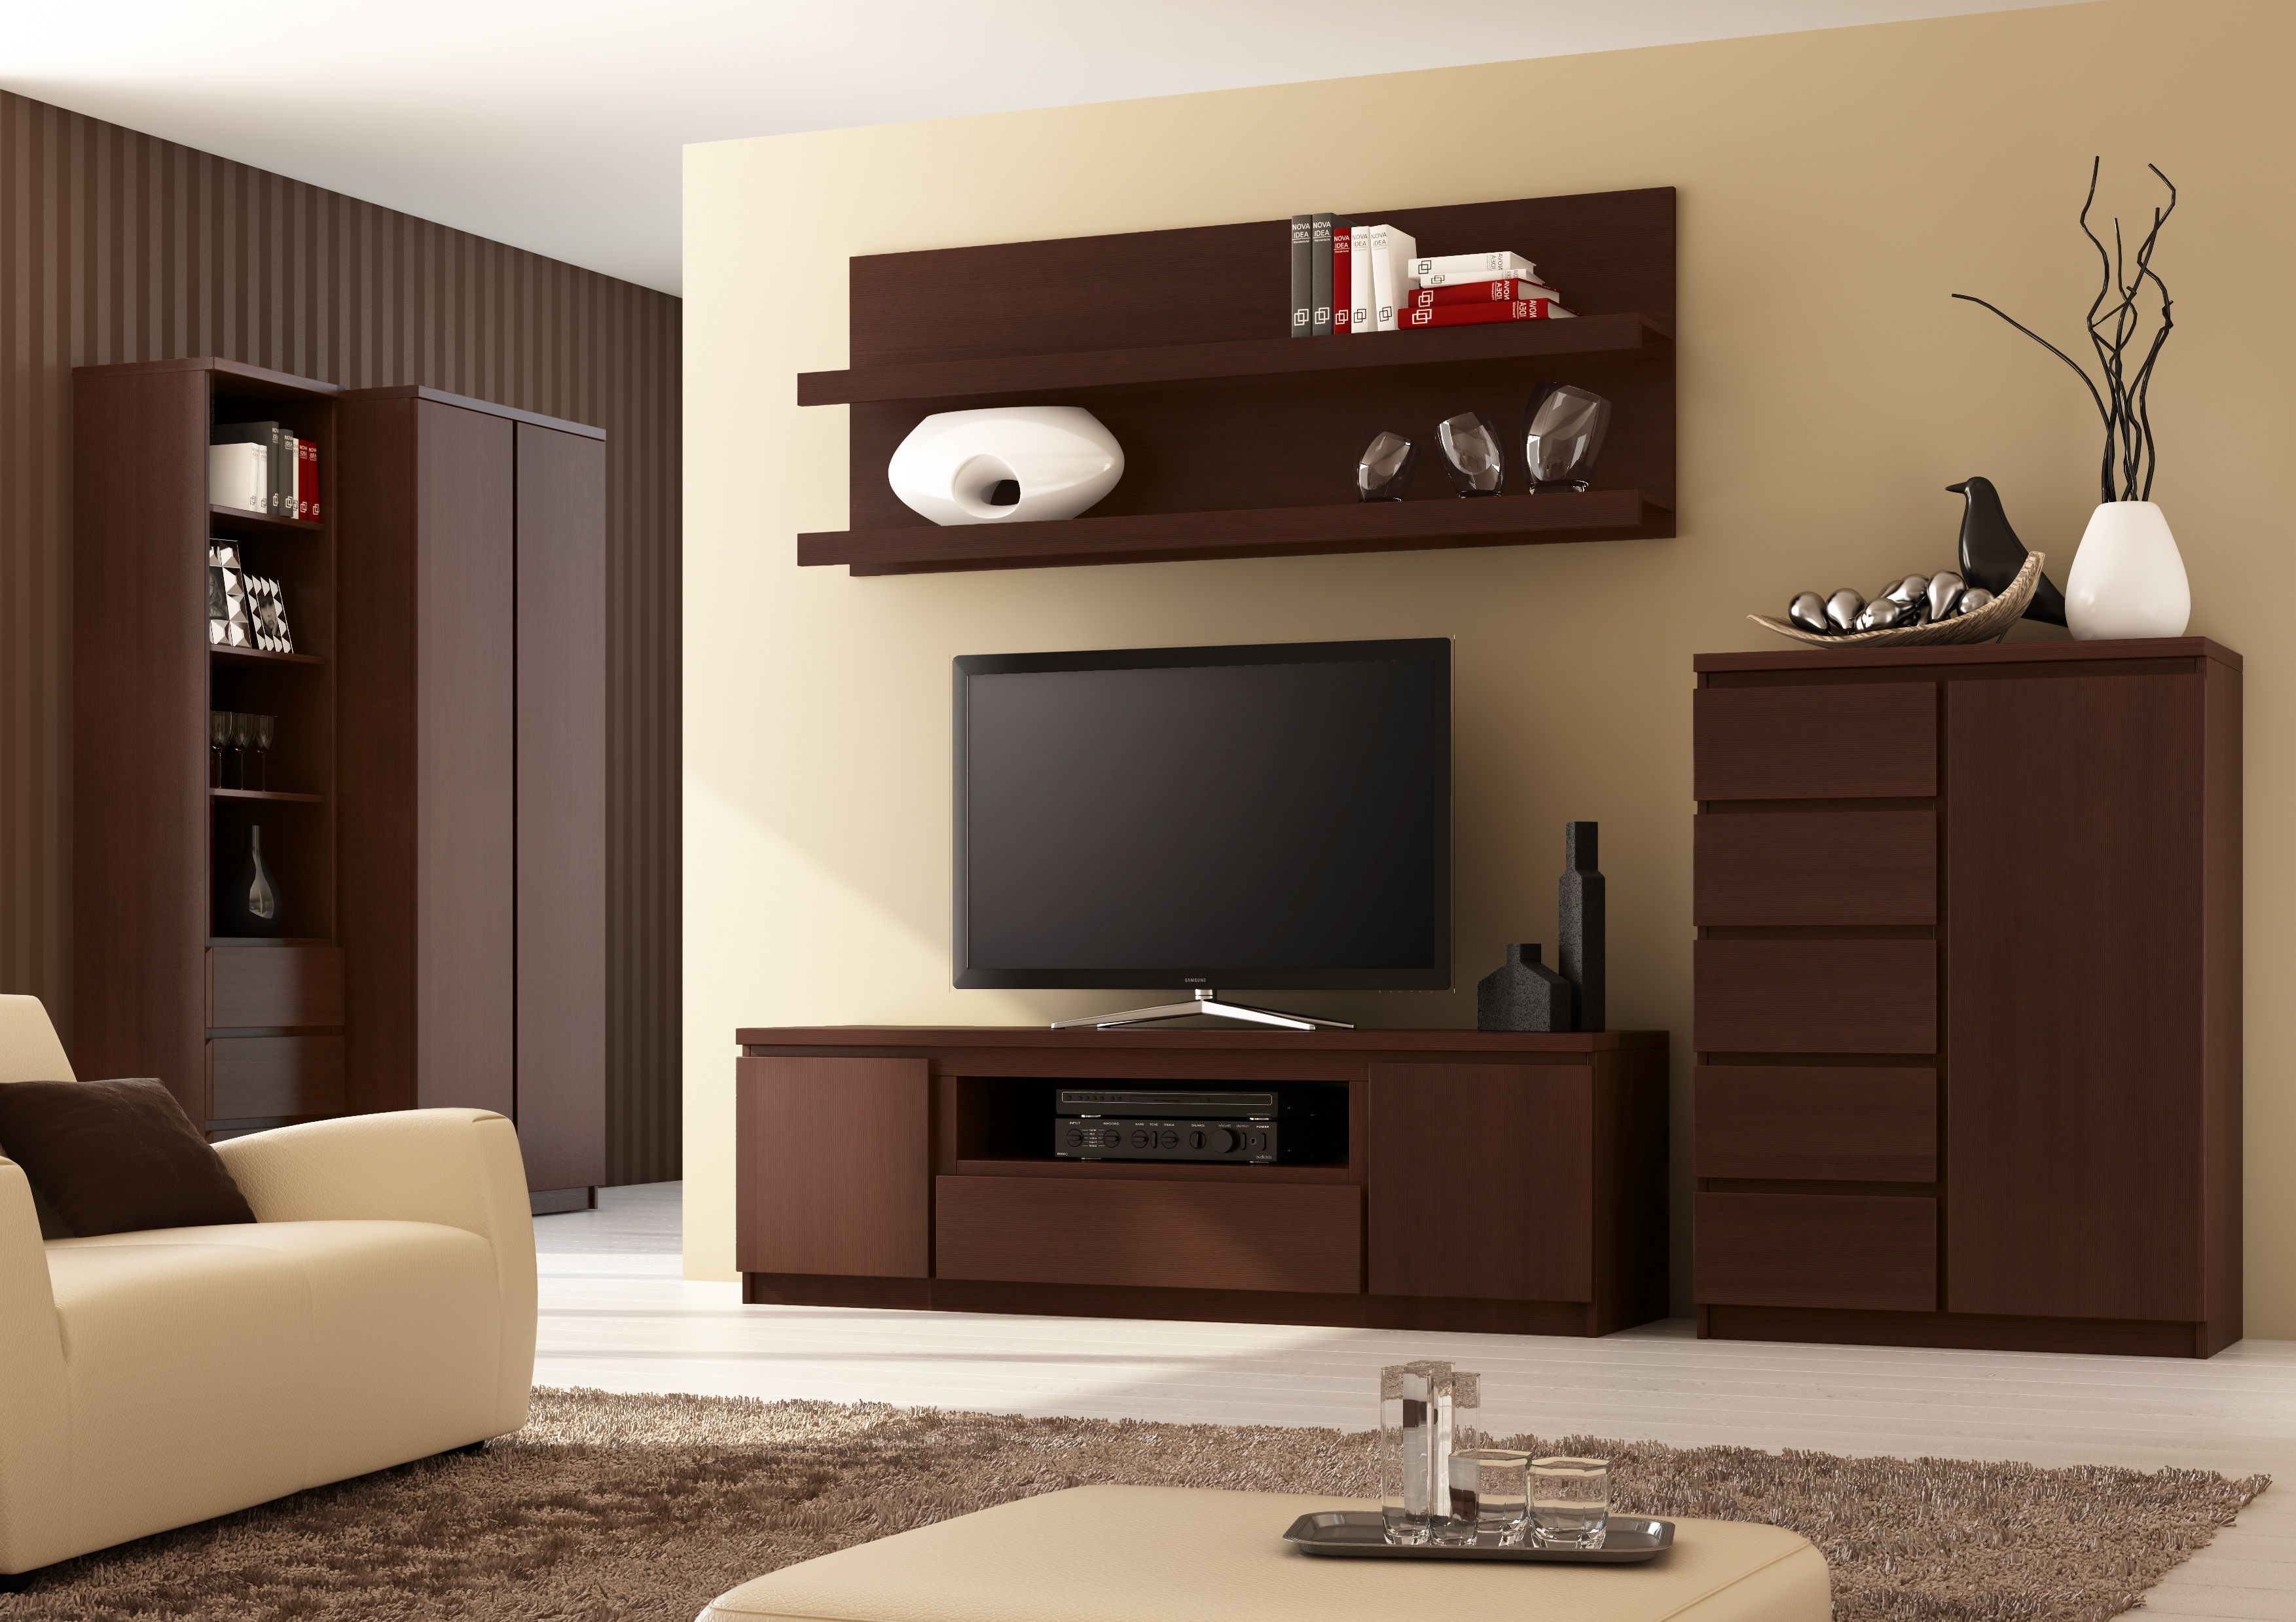 Moderne Tv Meubel : Modern tv meubel te koop u ac in bornem dehands be